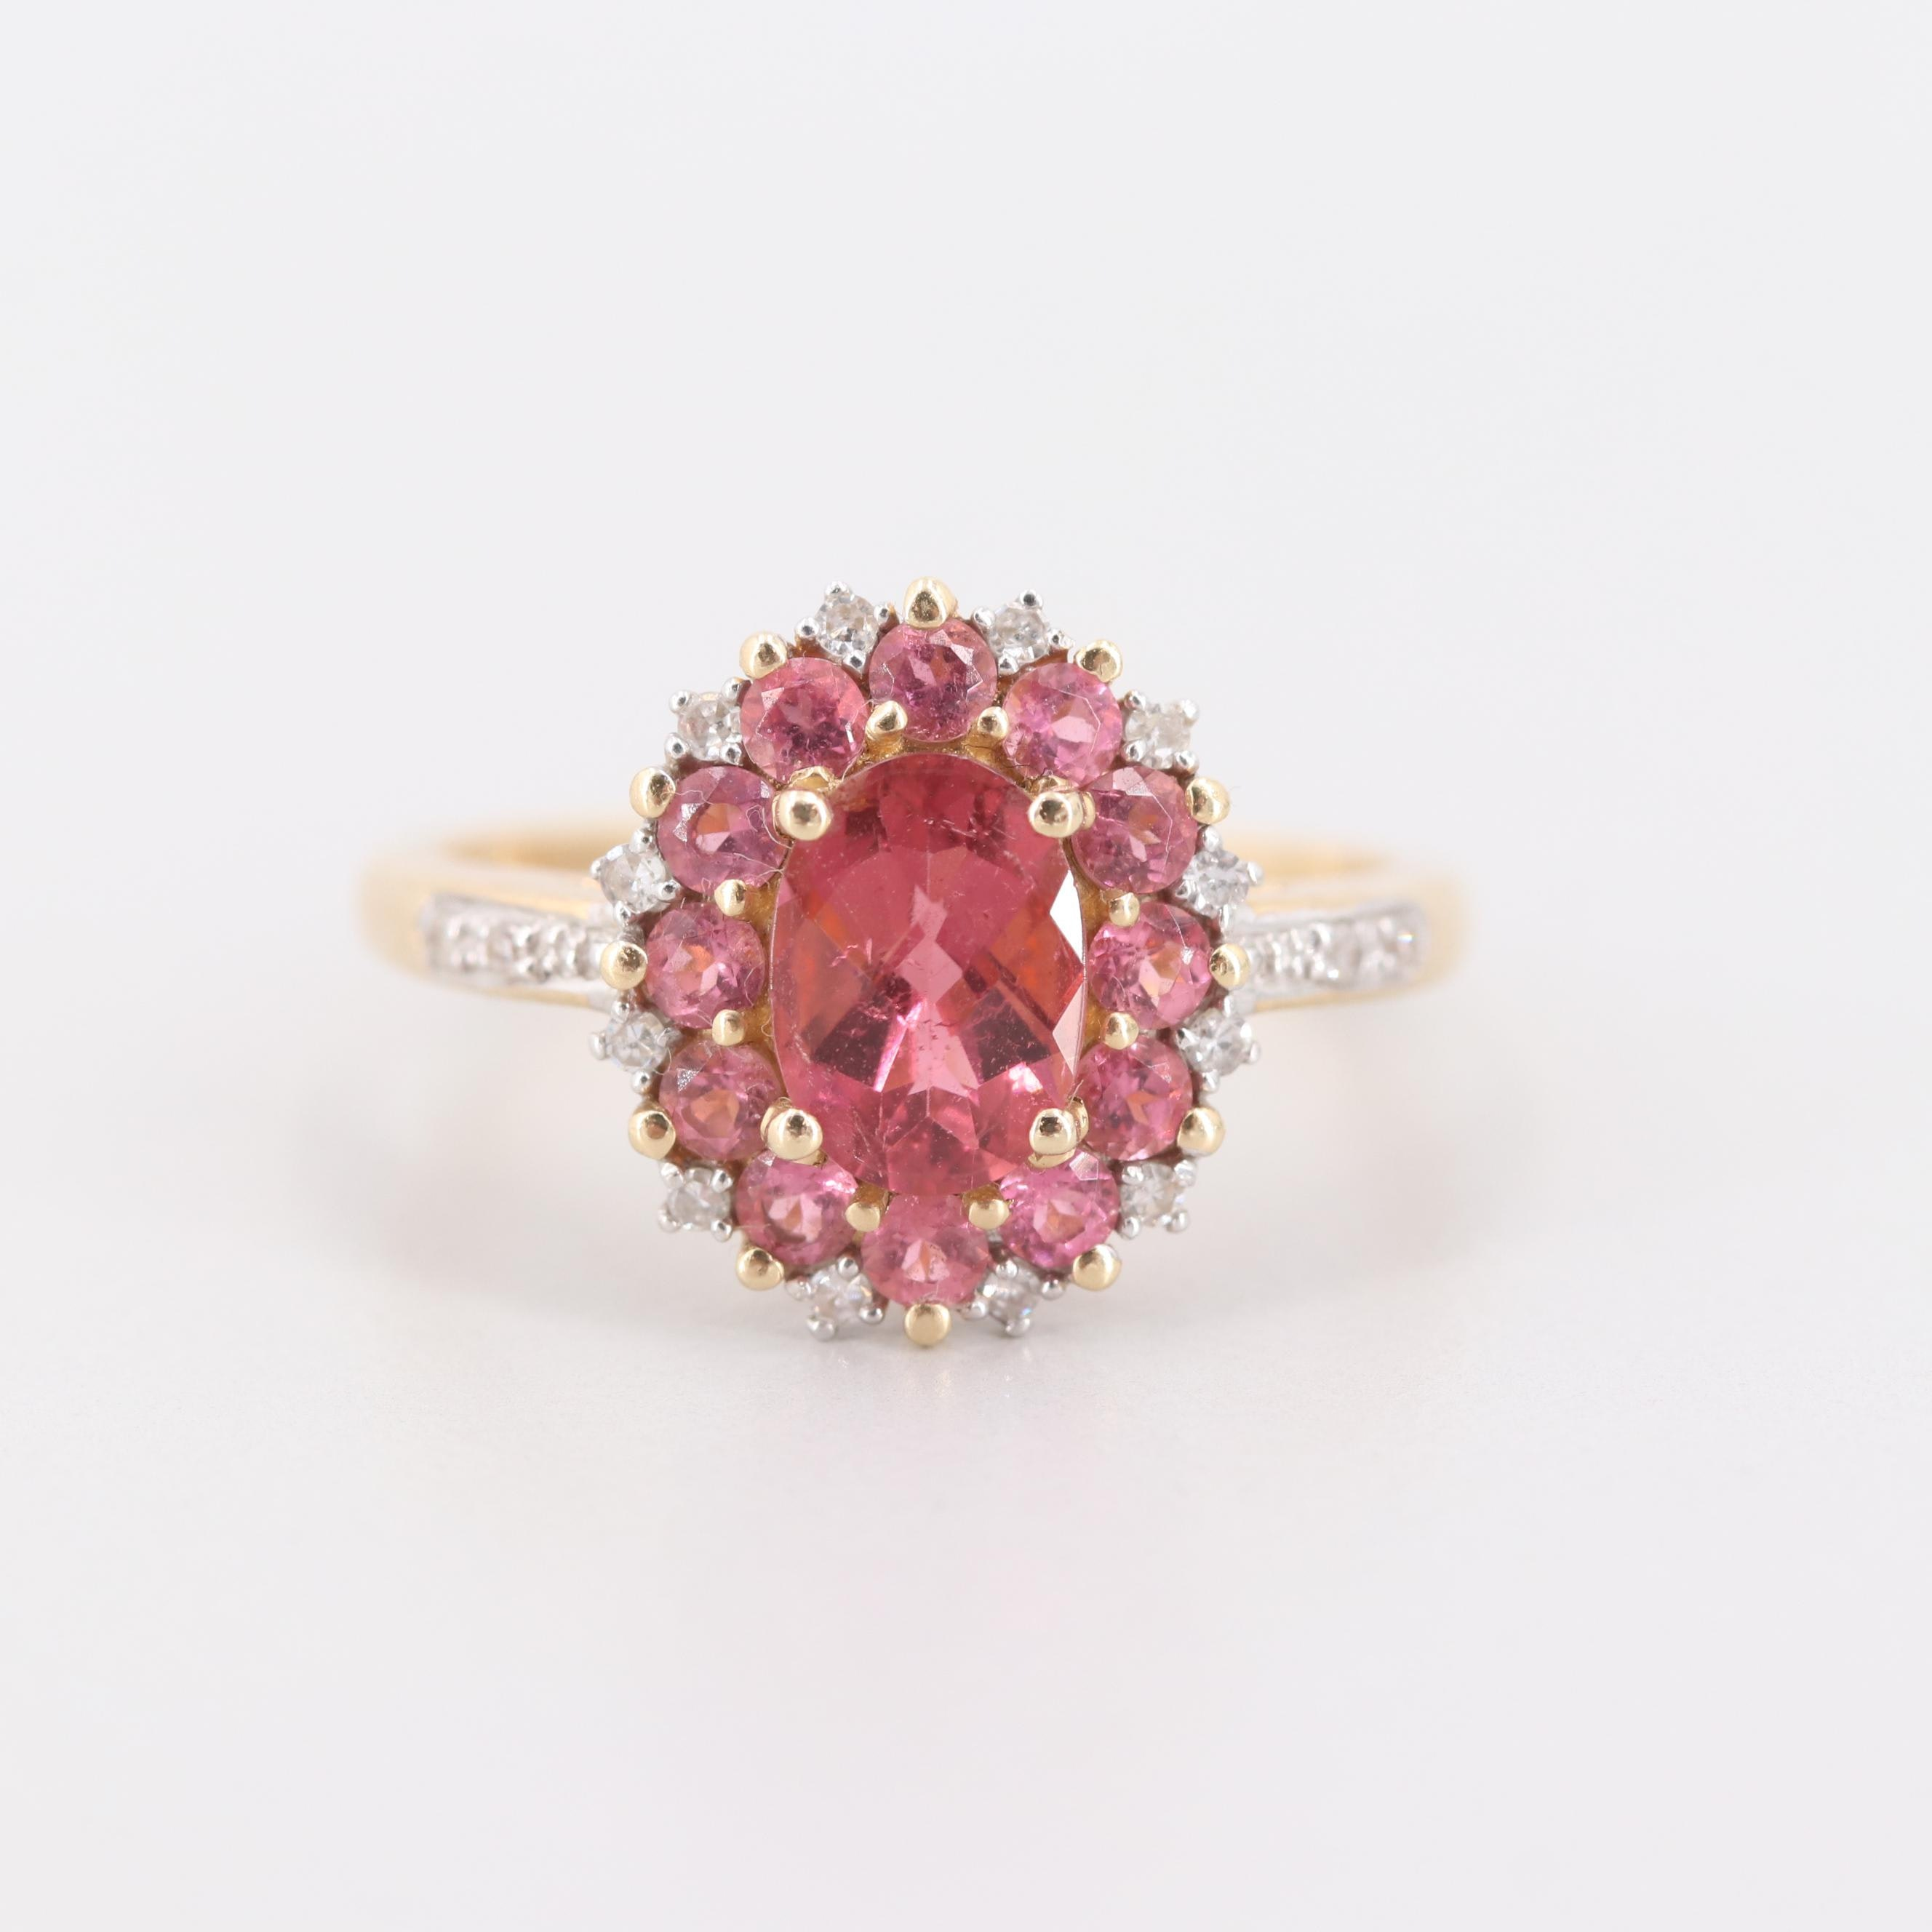 14K Yellow Gold Pink Tourmaline and Diamond Halo Ring